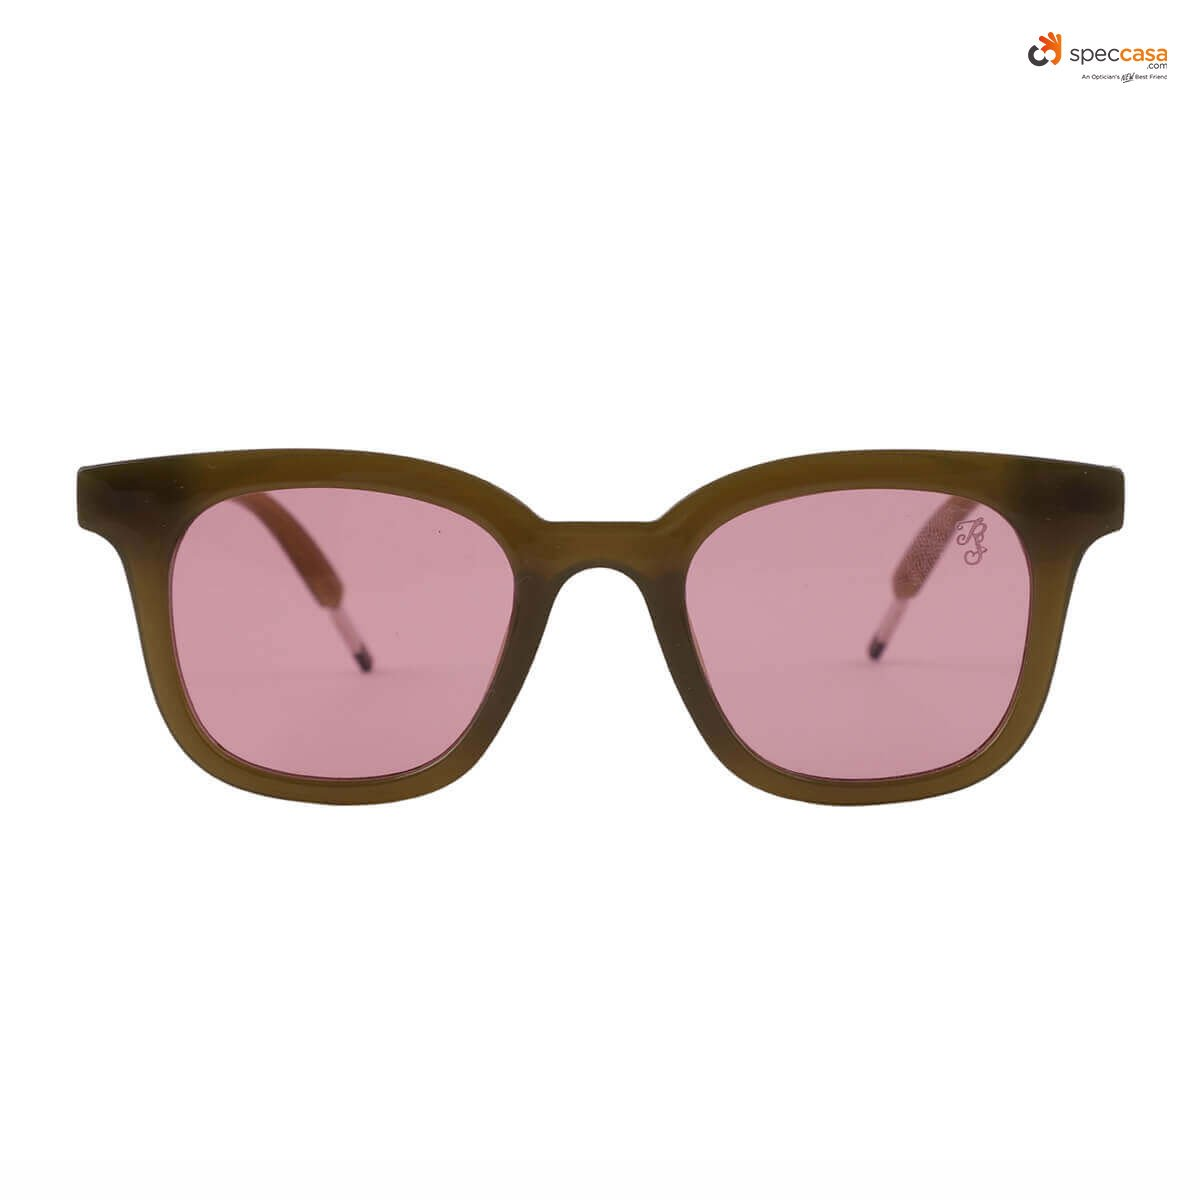 c3fc081efa3 Speccasa Eyewear ( speccasa)